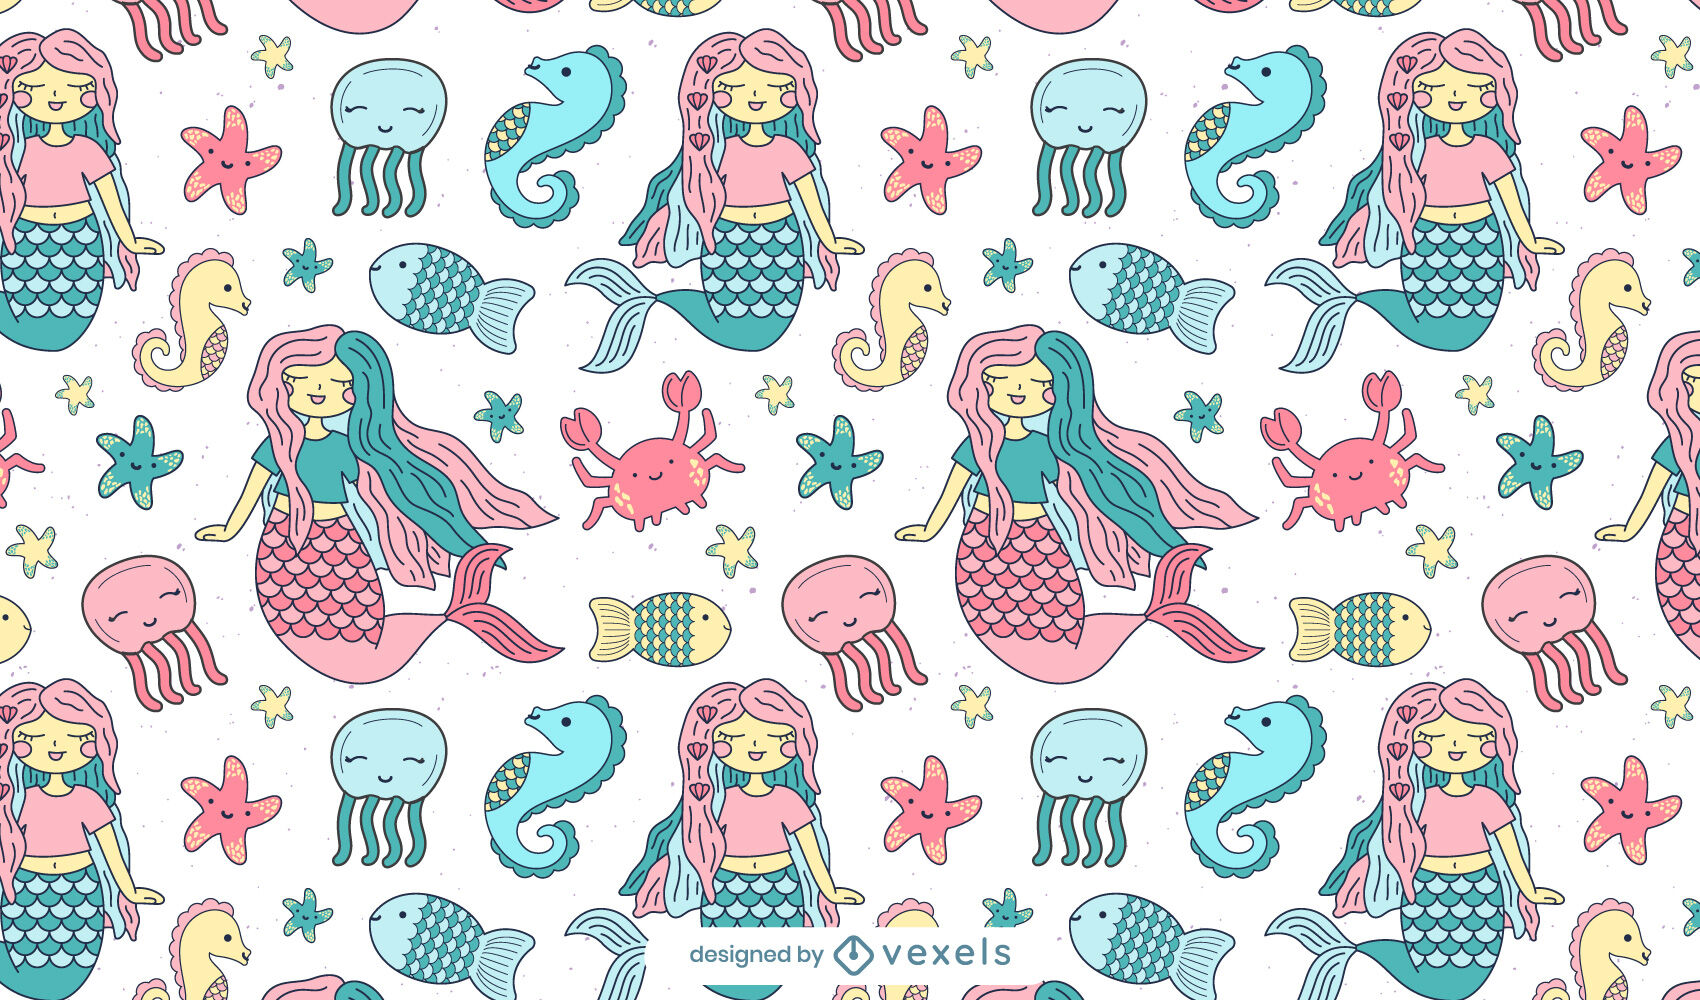 Mermaids and sea animals pattern design